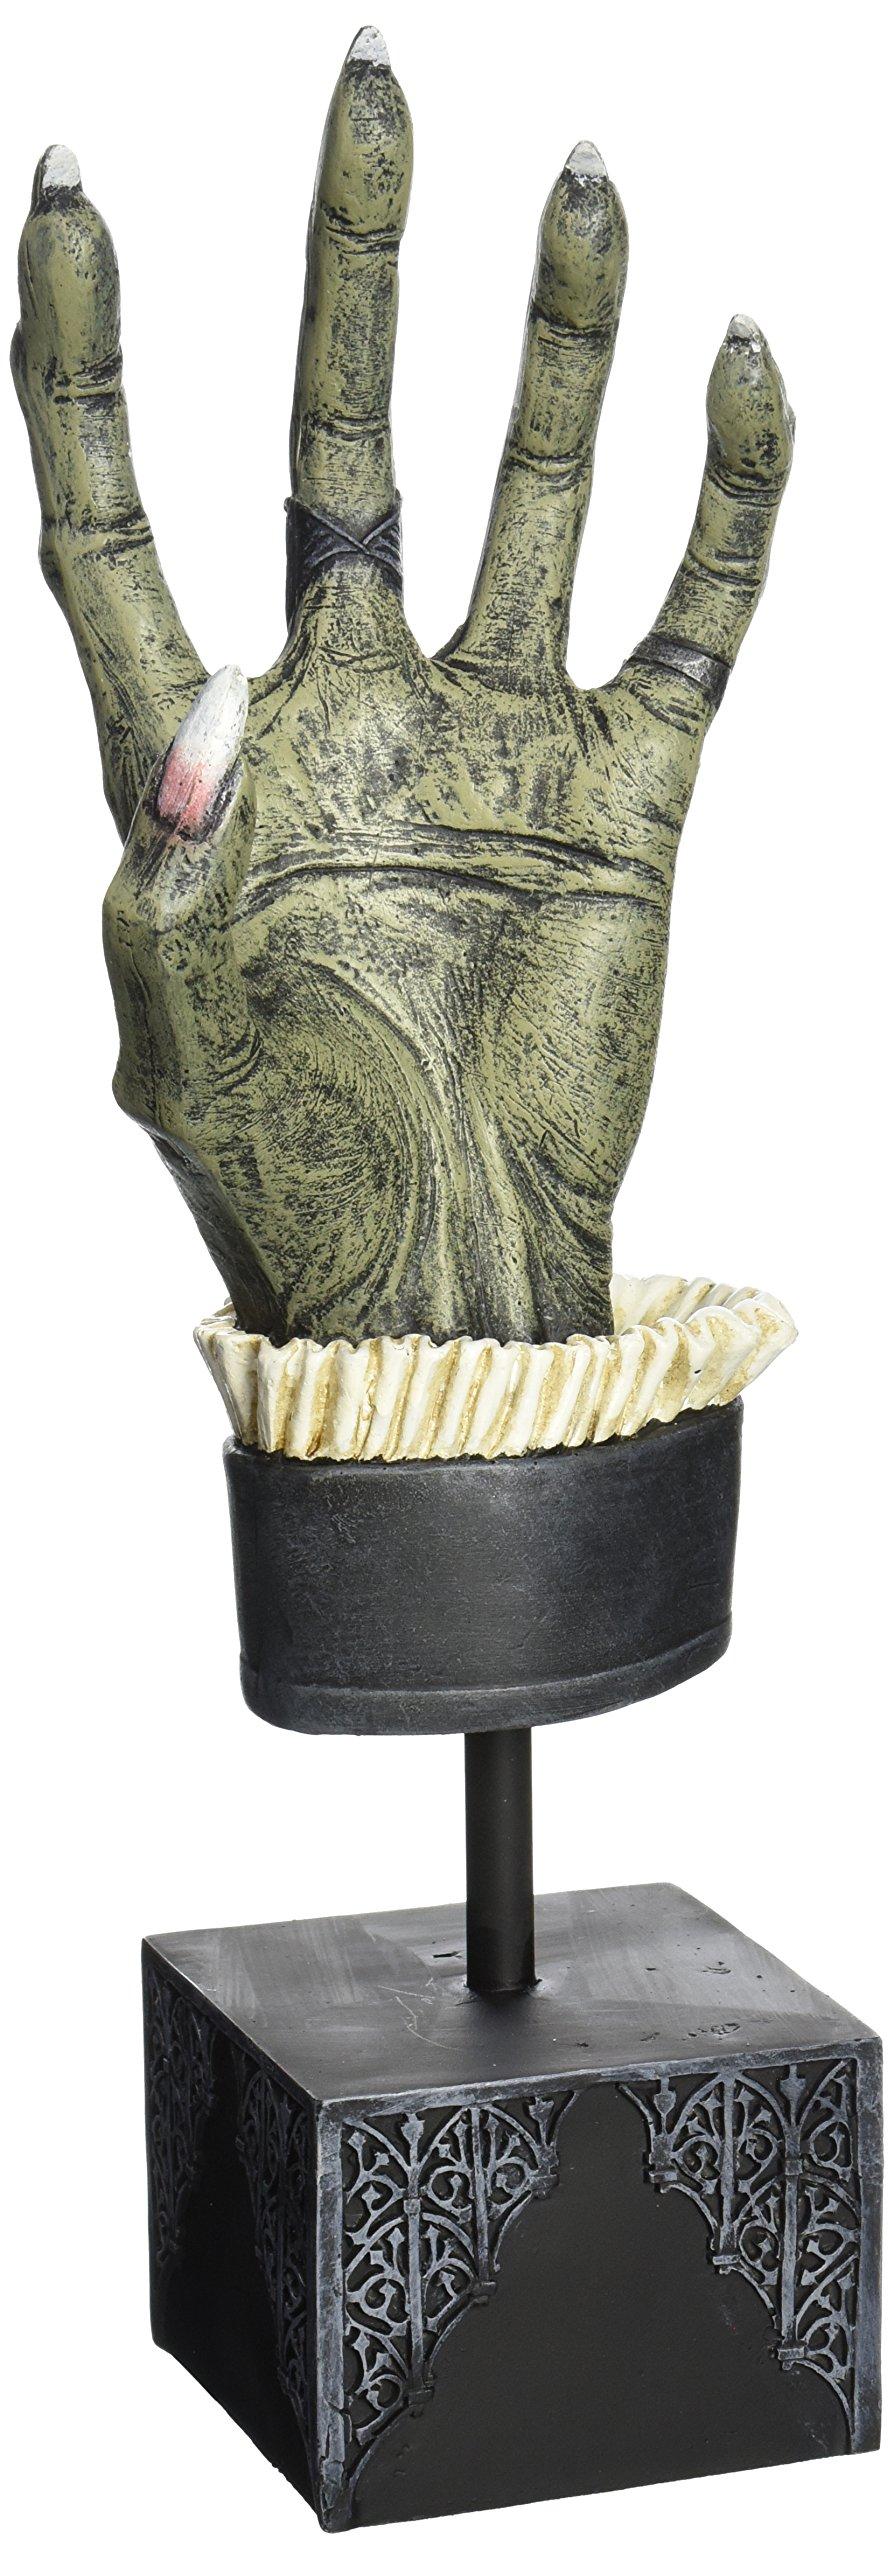 Design Toscano The Vampire Hand Of Dracula Statue